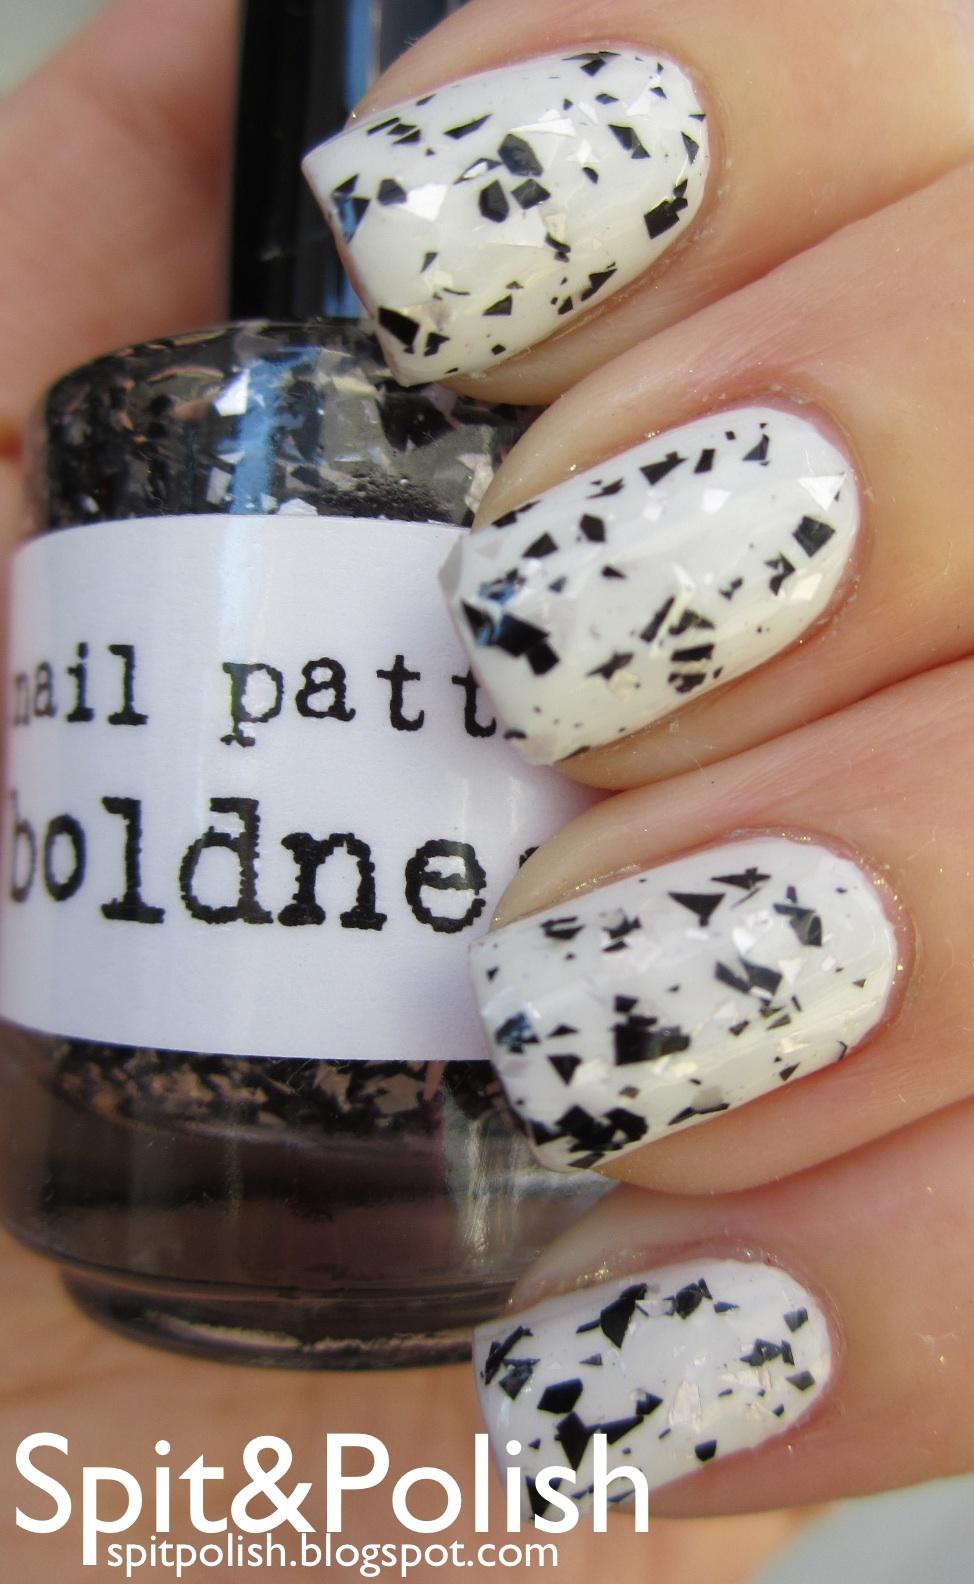 Spit & Polish: Nail Pattern Boldness